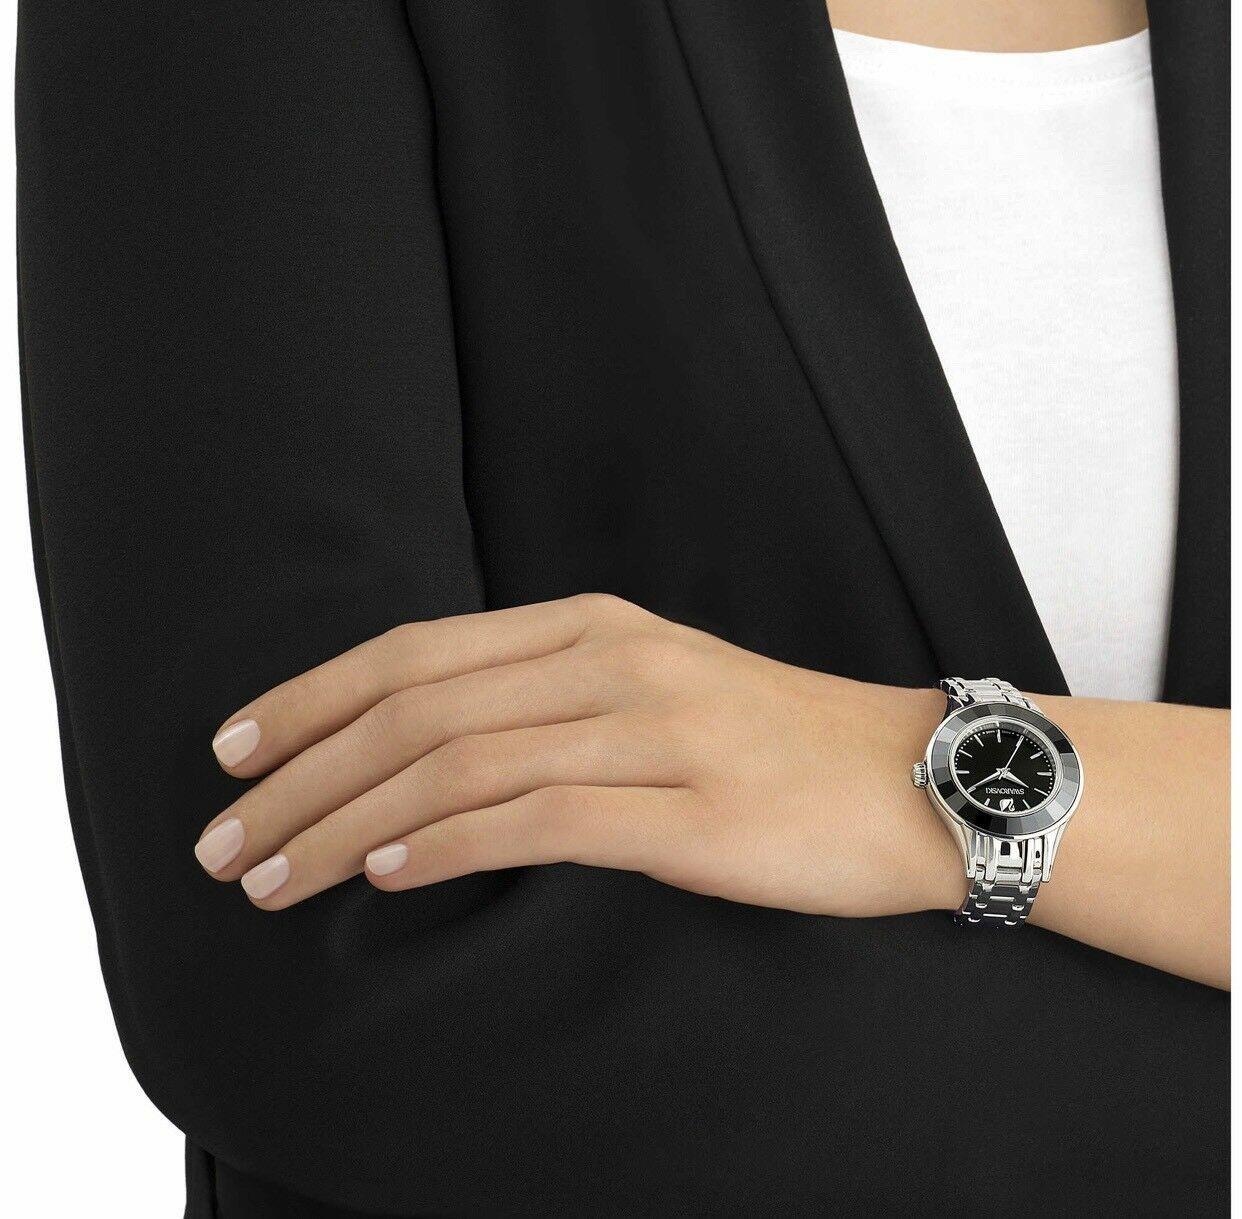 Swarovski Crystal ALEGRIA WATCH, METAL BRACELET BLACK SILVER Ladies Authentic